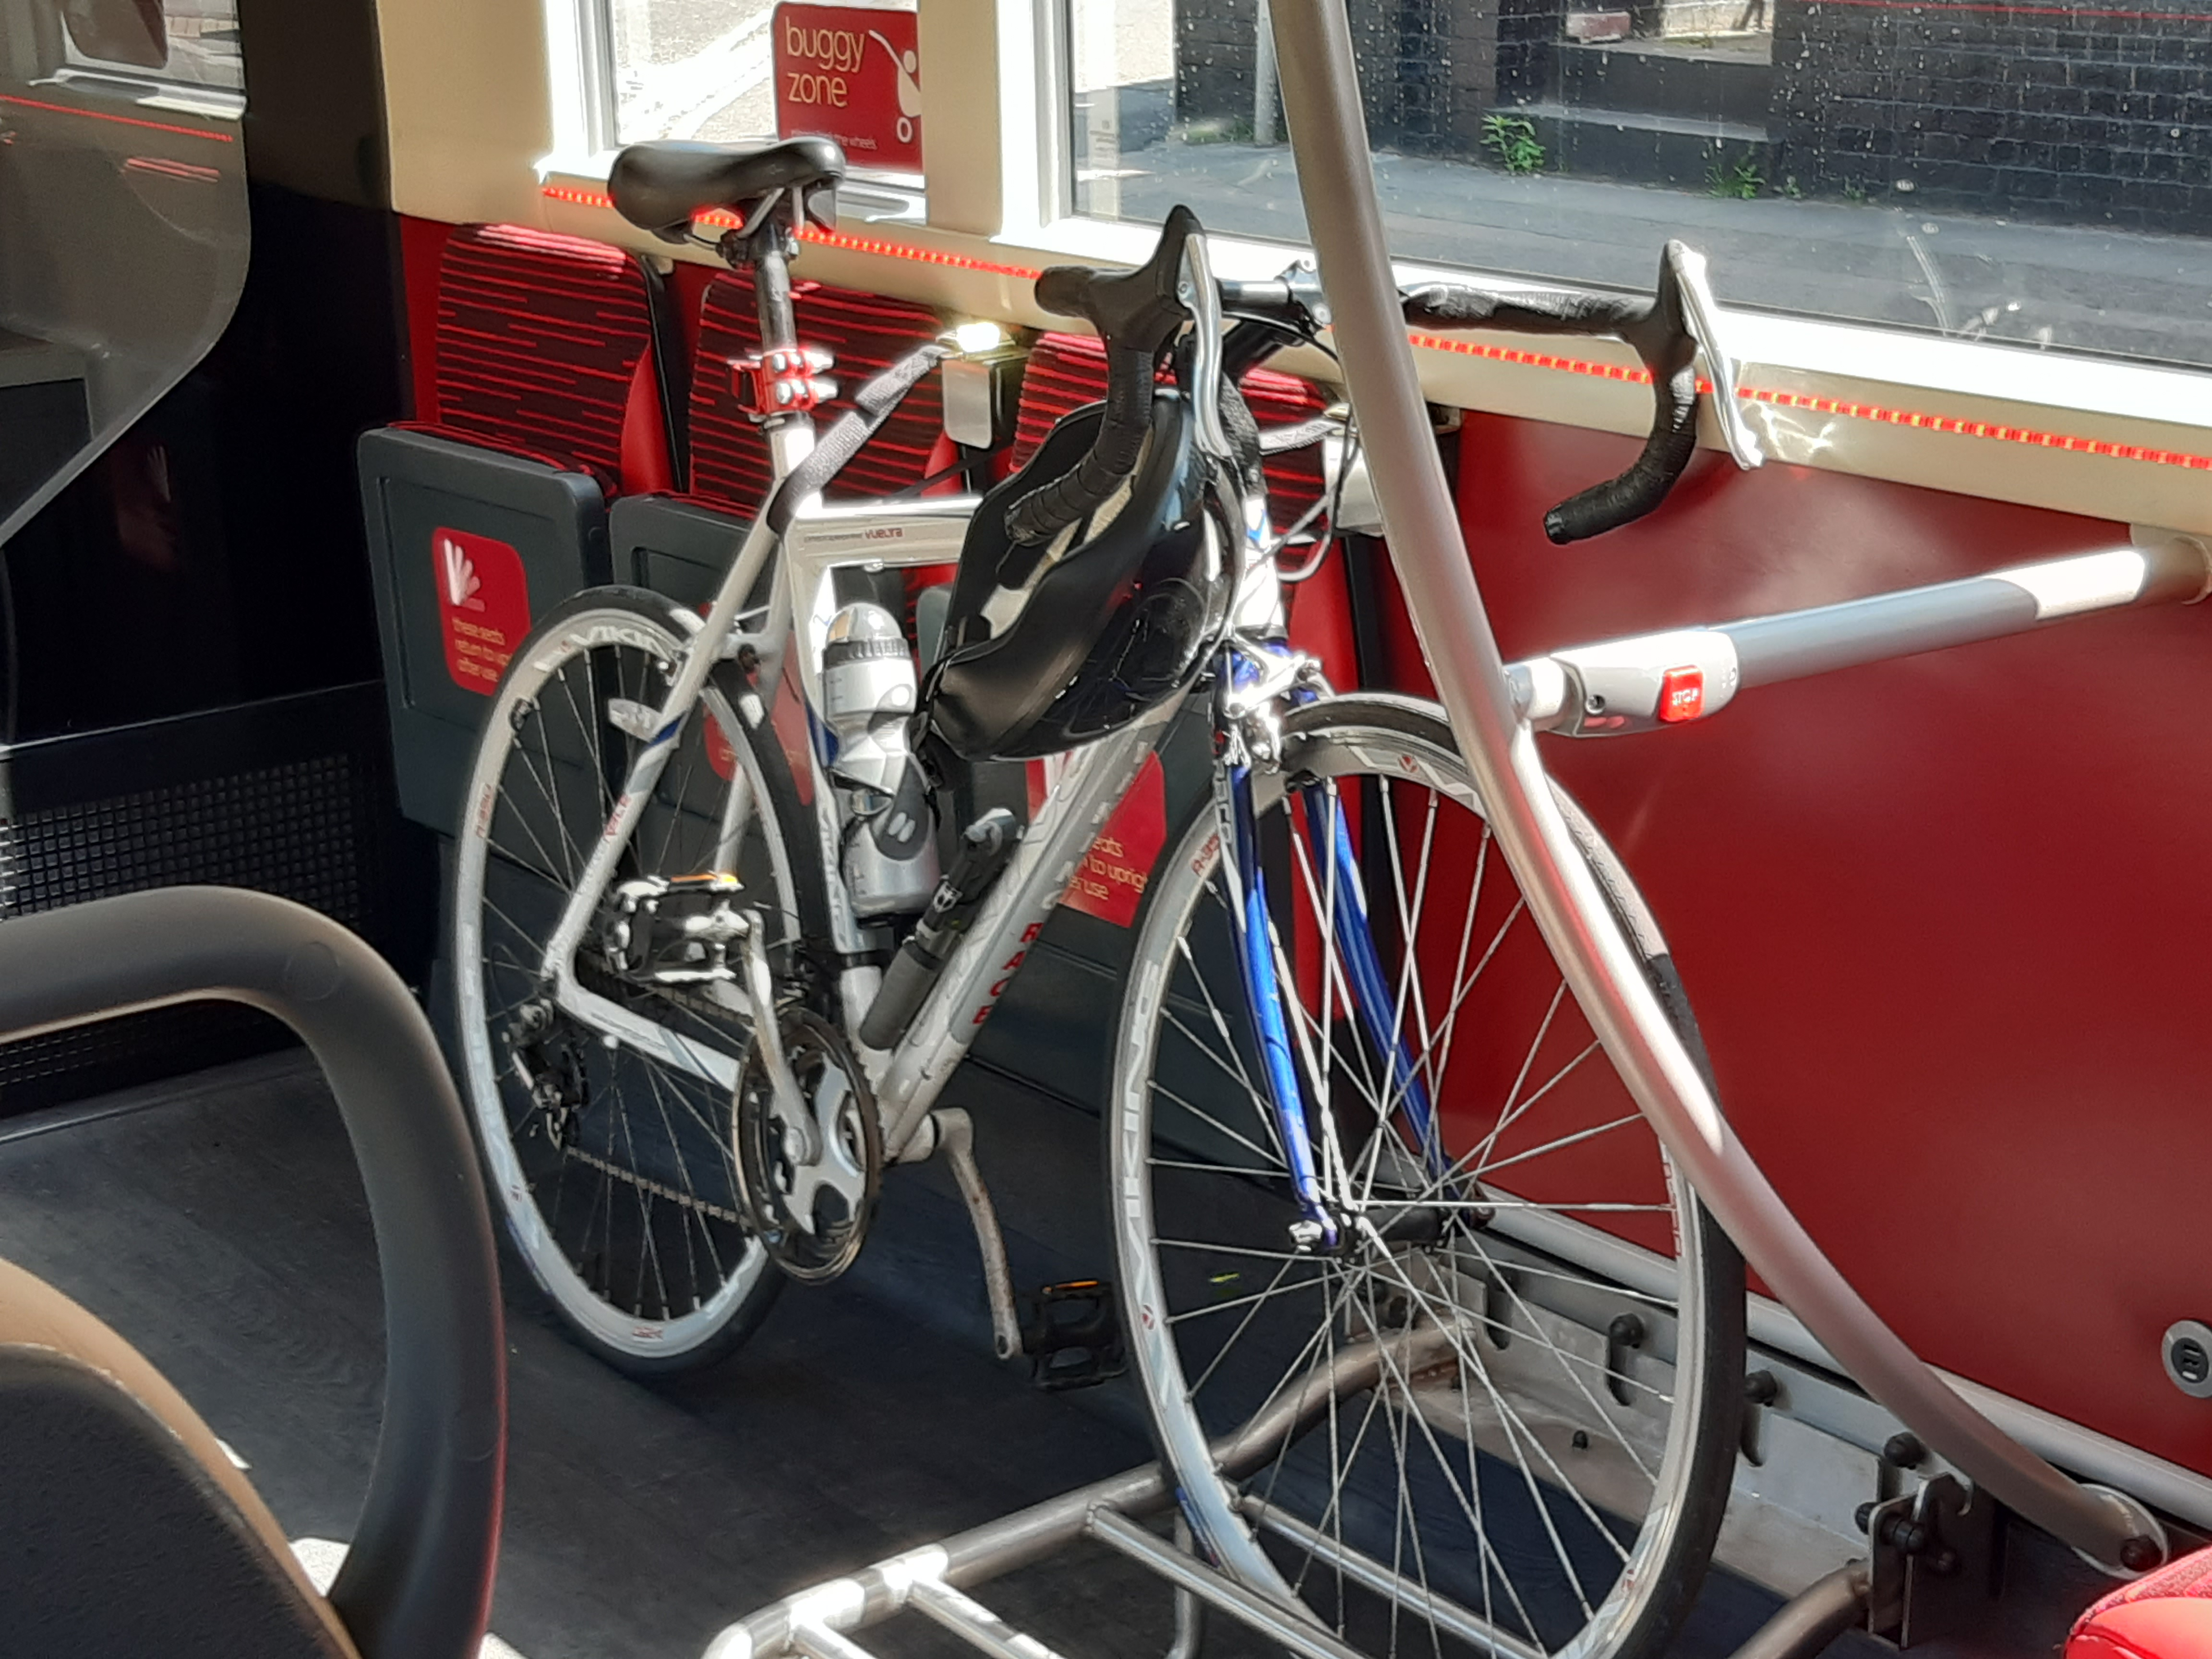 A bike on board a bus